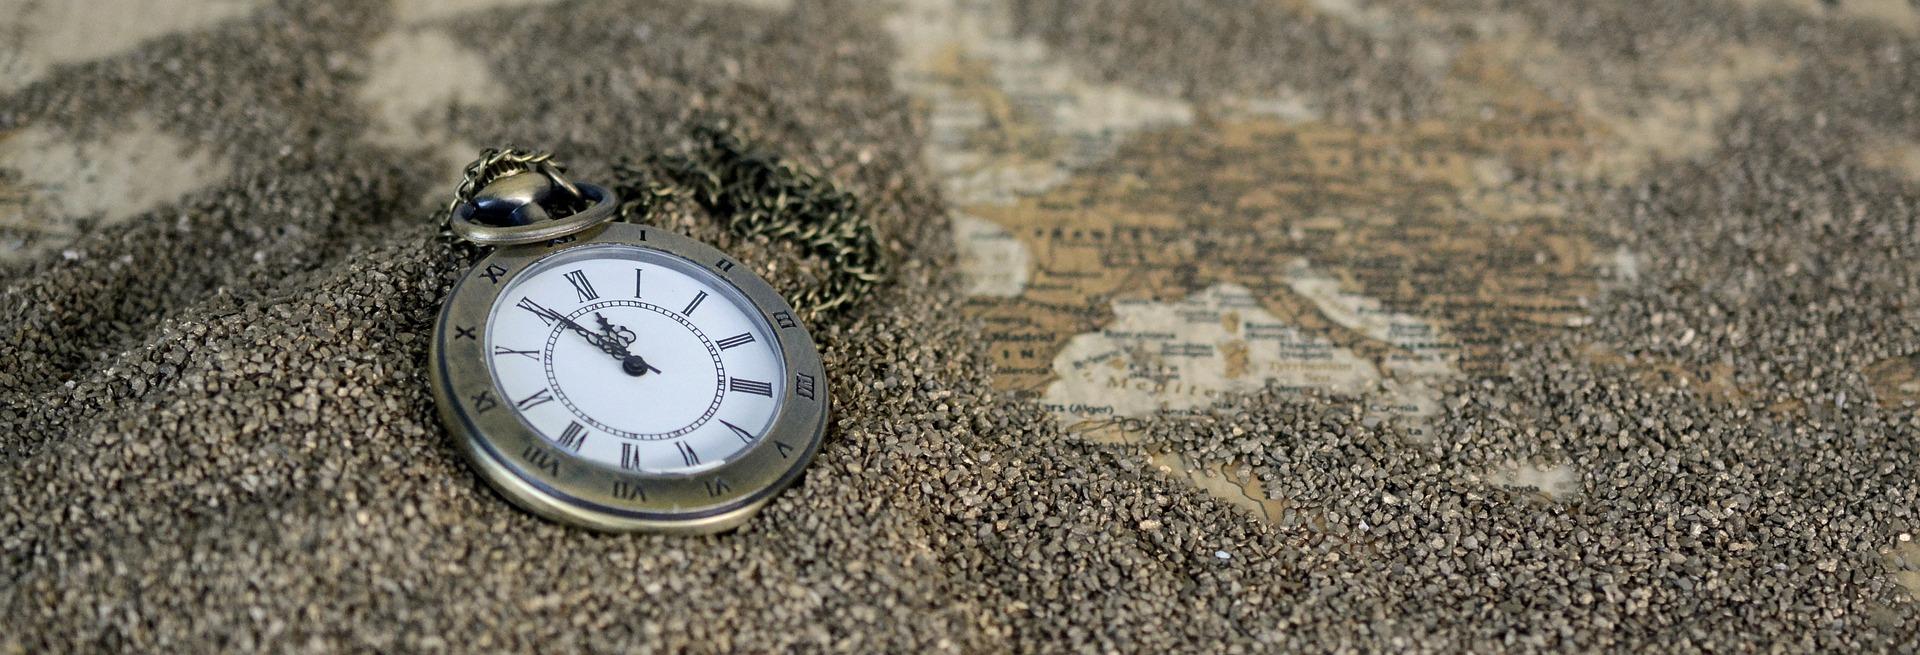 horloge ligt in zand